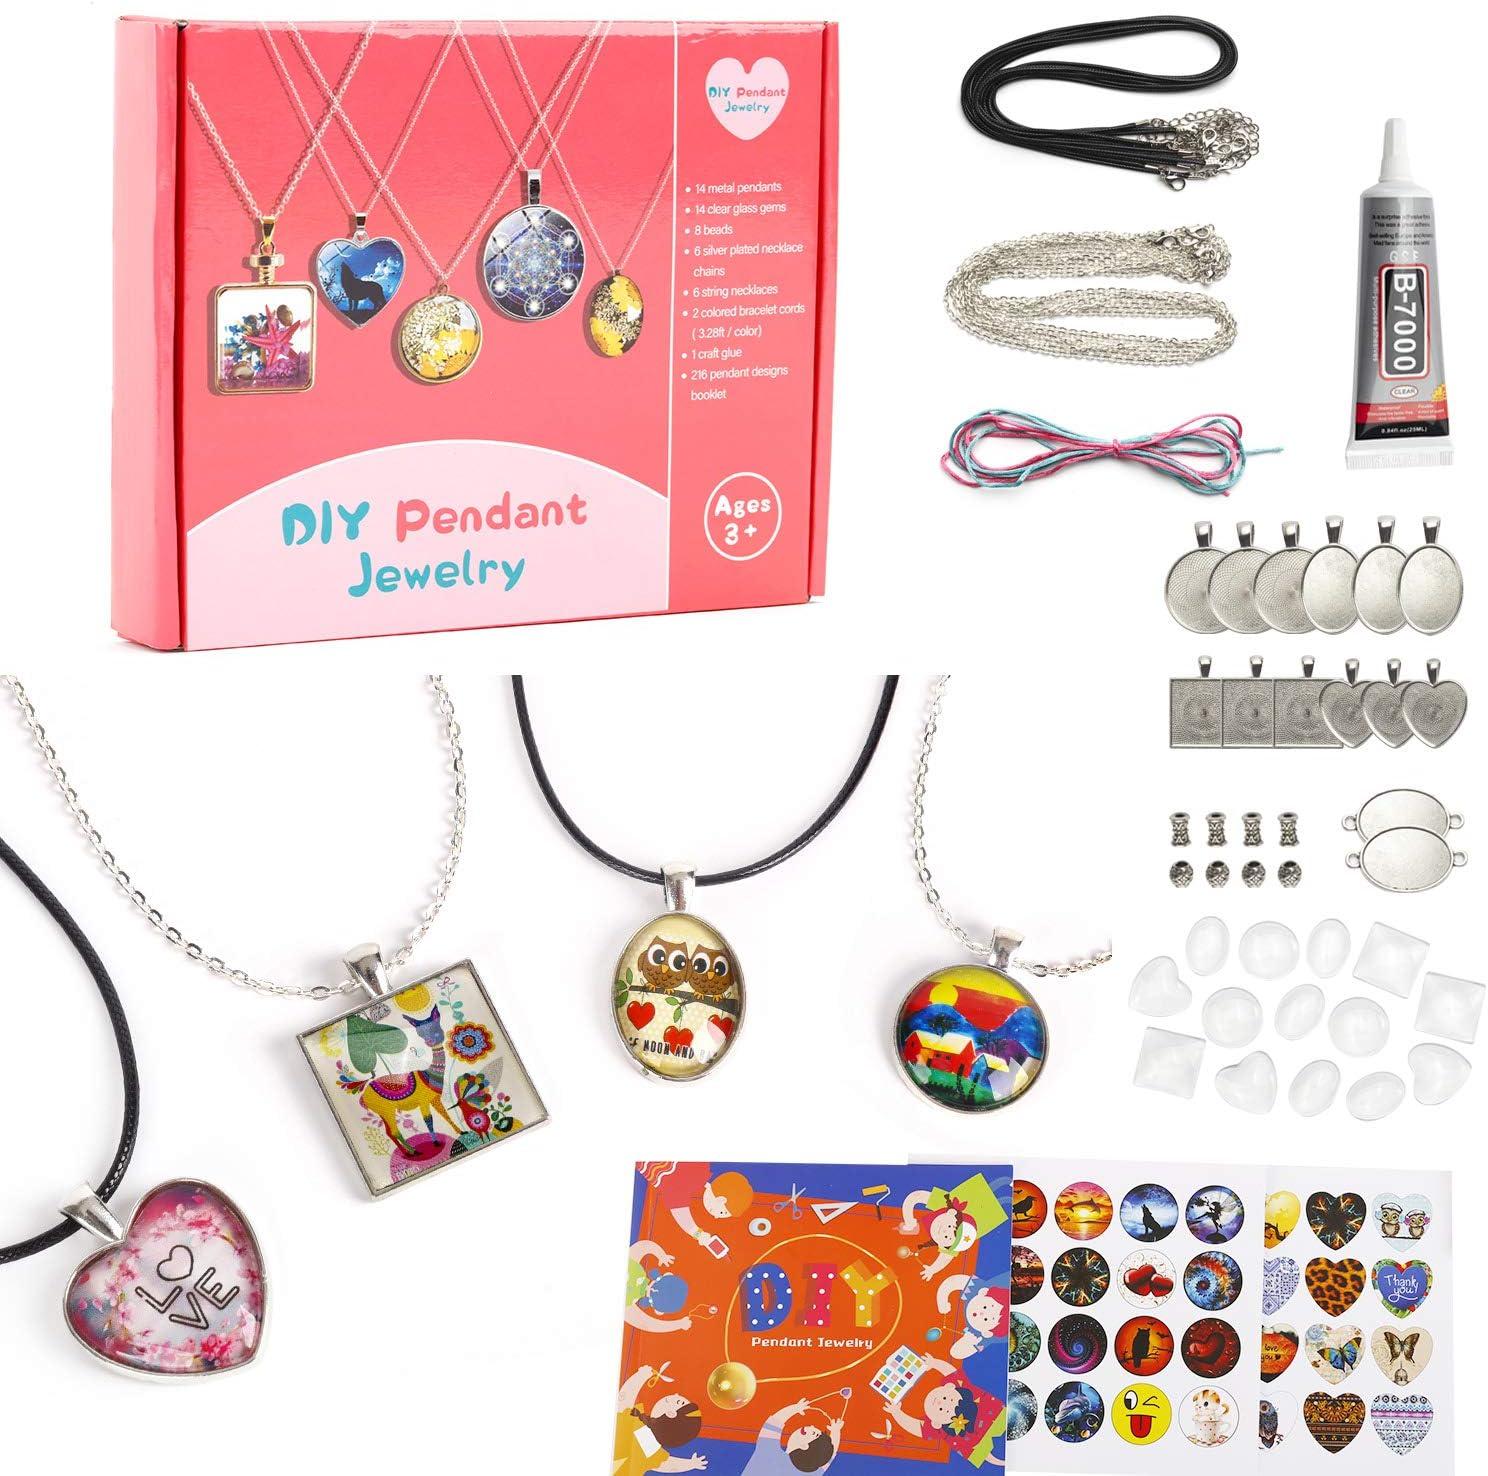 Juboury Girls Jewelry Making Kit Online limited Cheap SALE Start product DIY Craft - Pendan